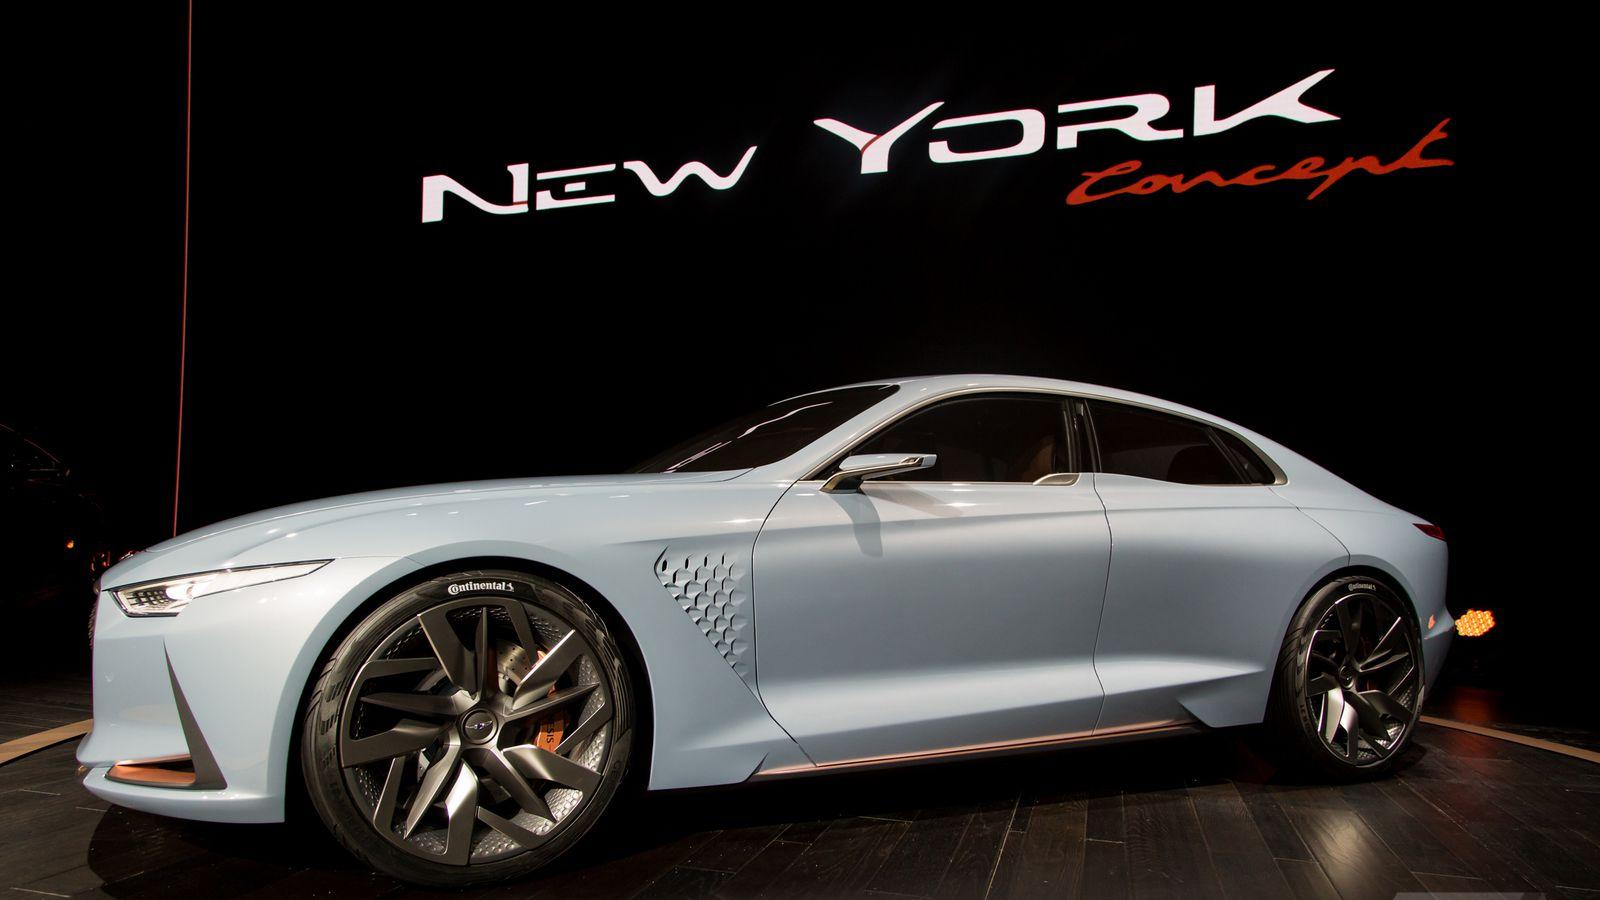 Genesis New York Concept Is A Sports Sedan Thatll Make